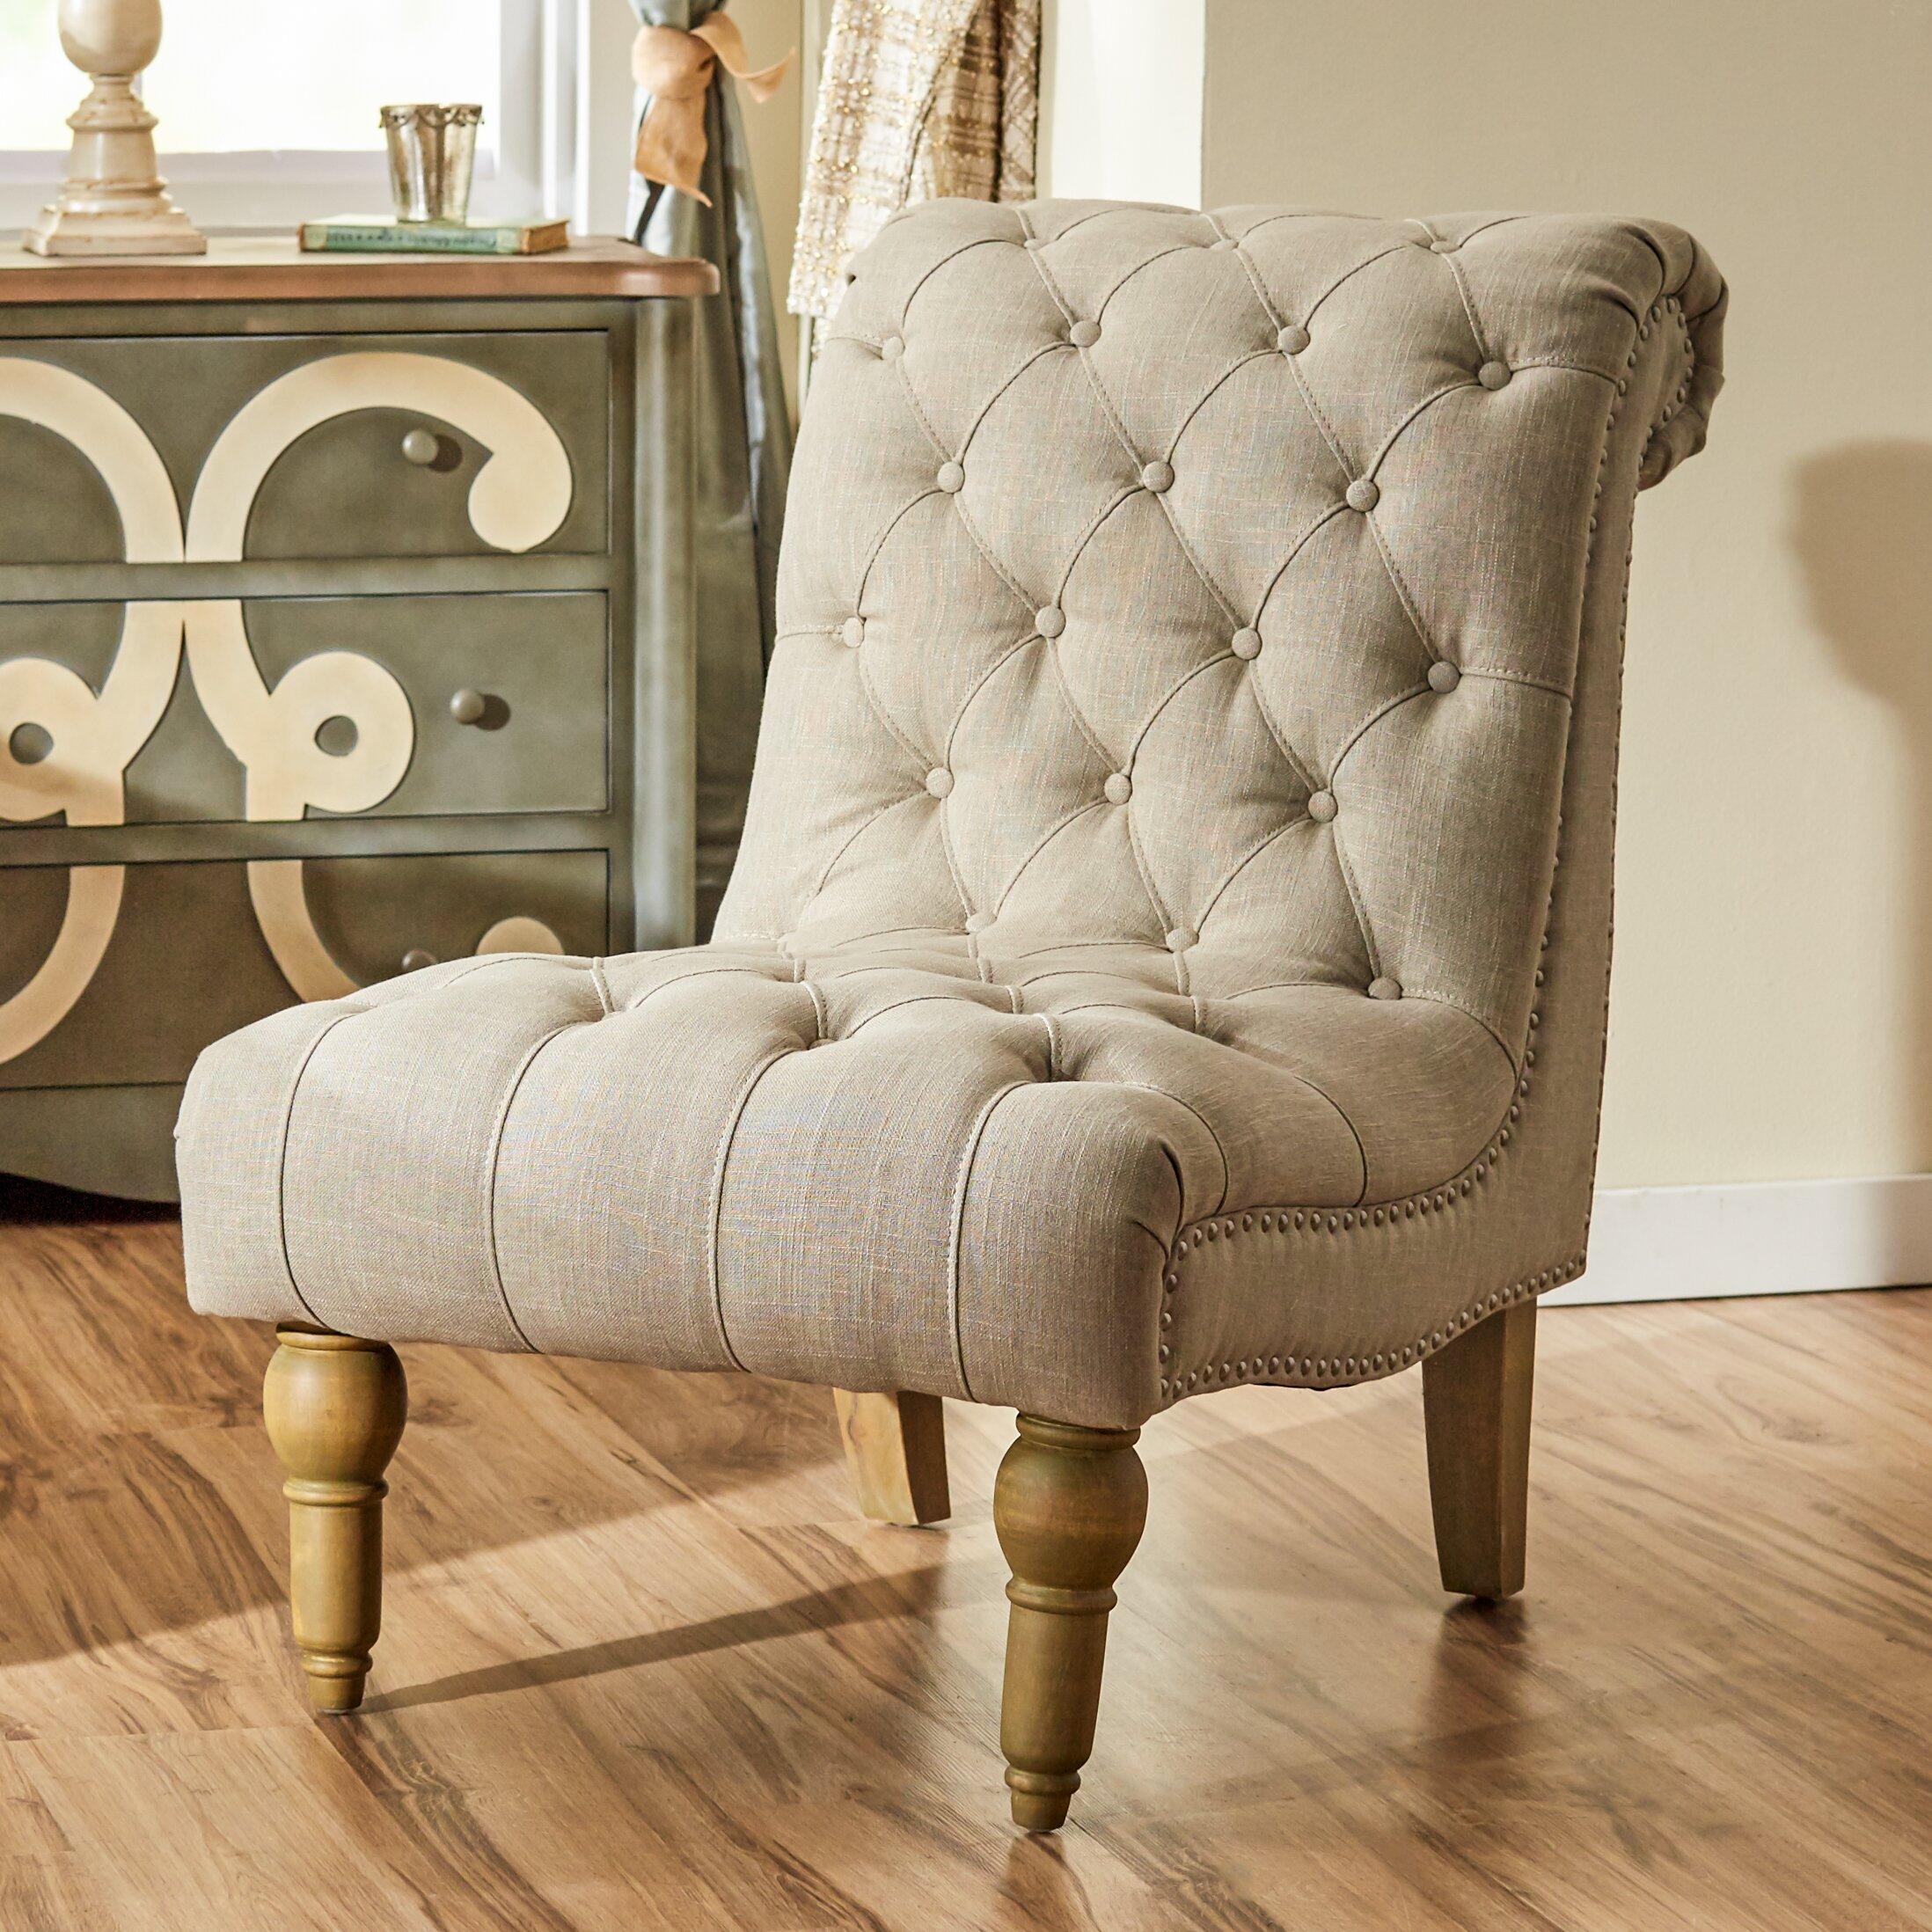 Lark manor versailles fabric slipper chair reviews for Slipper chair